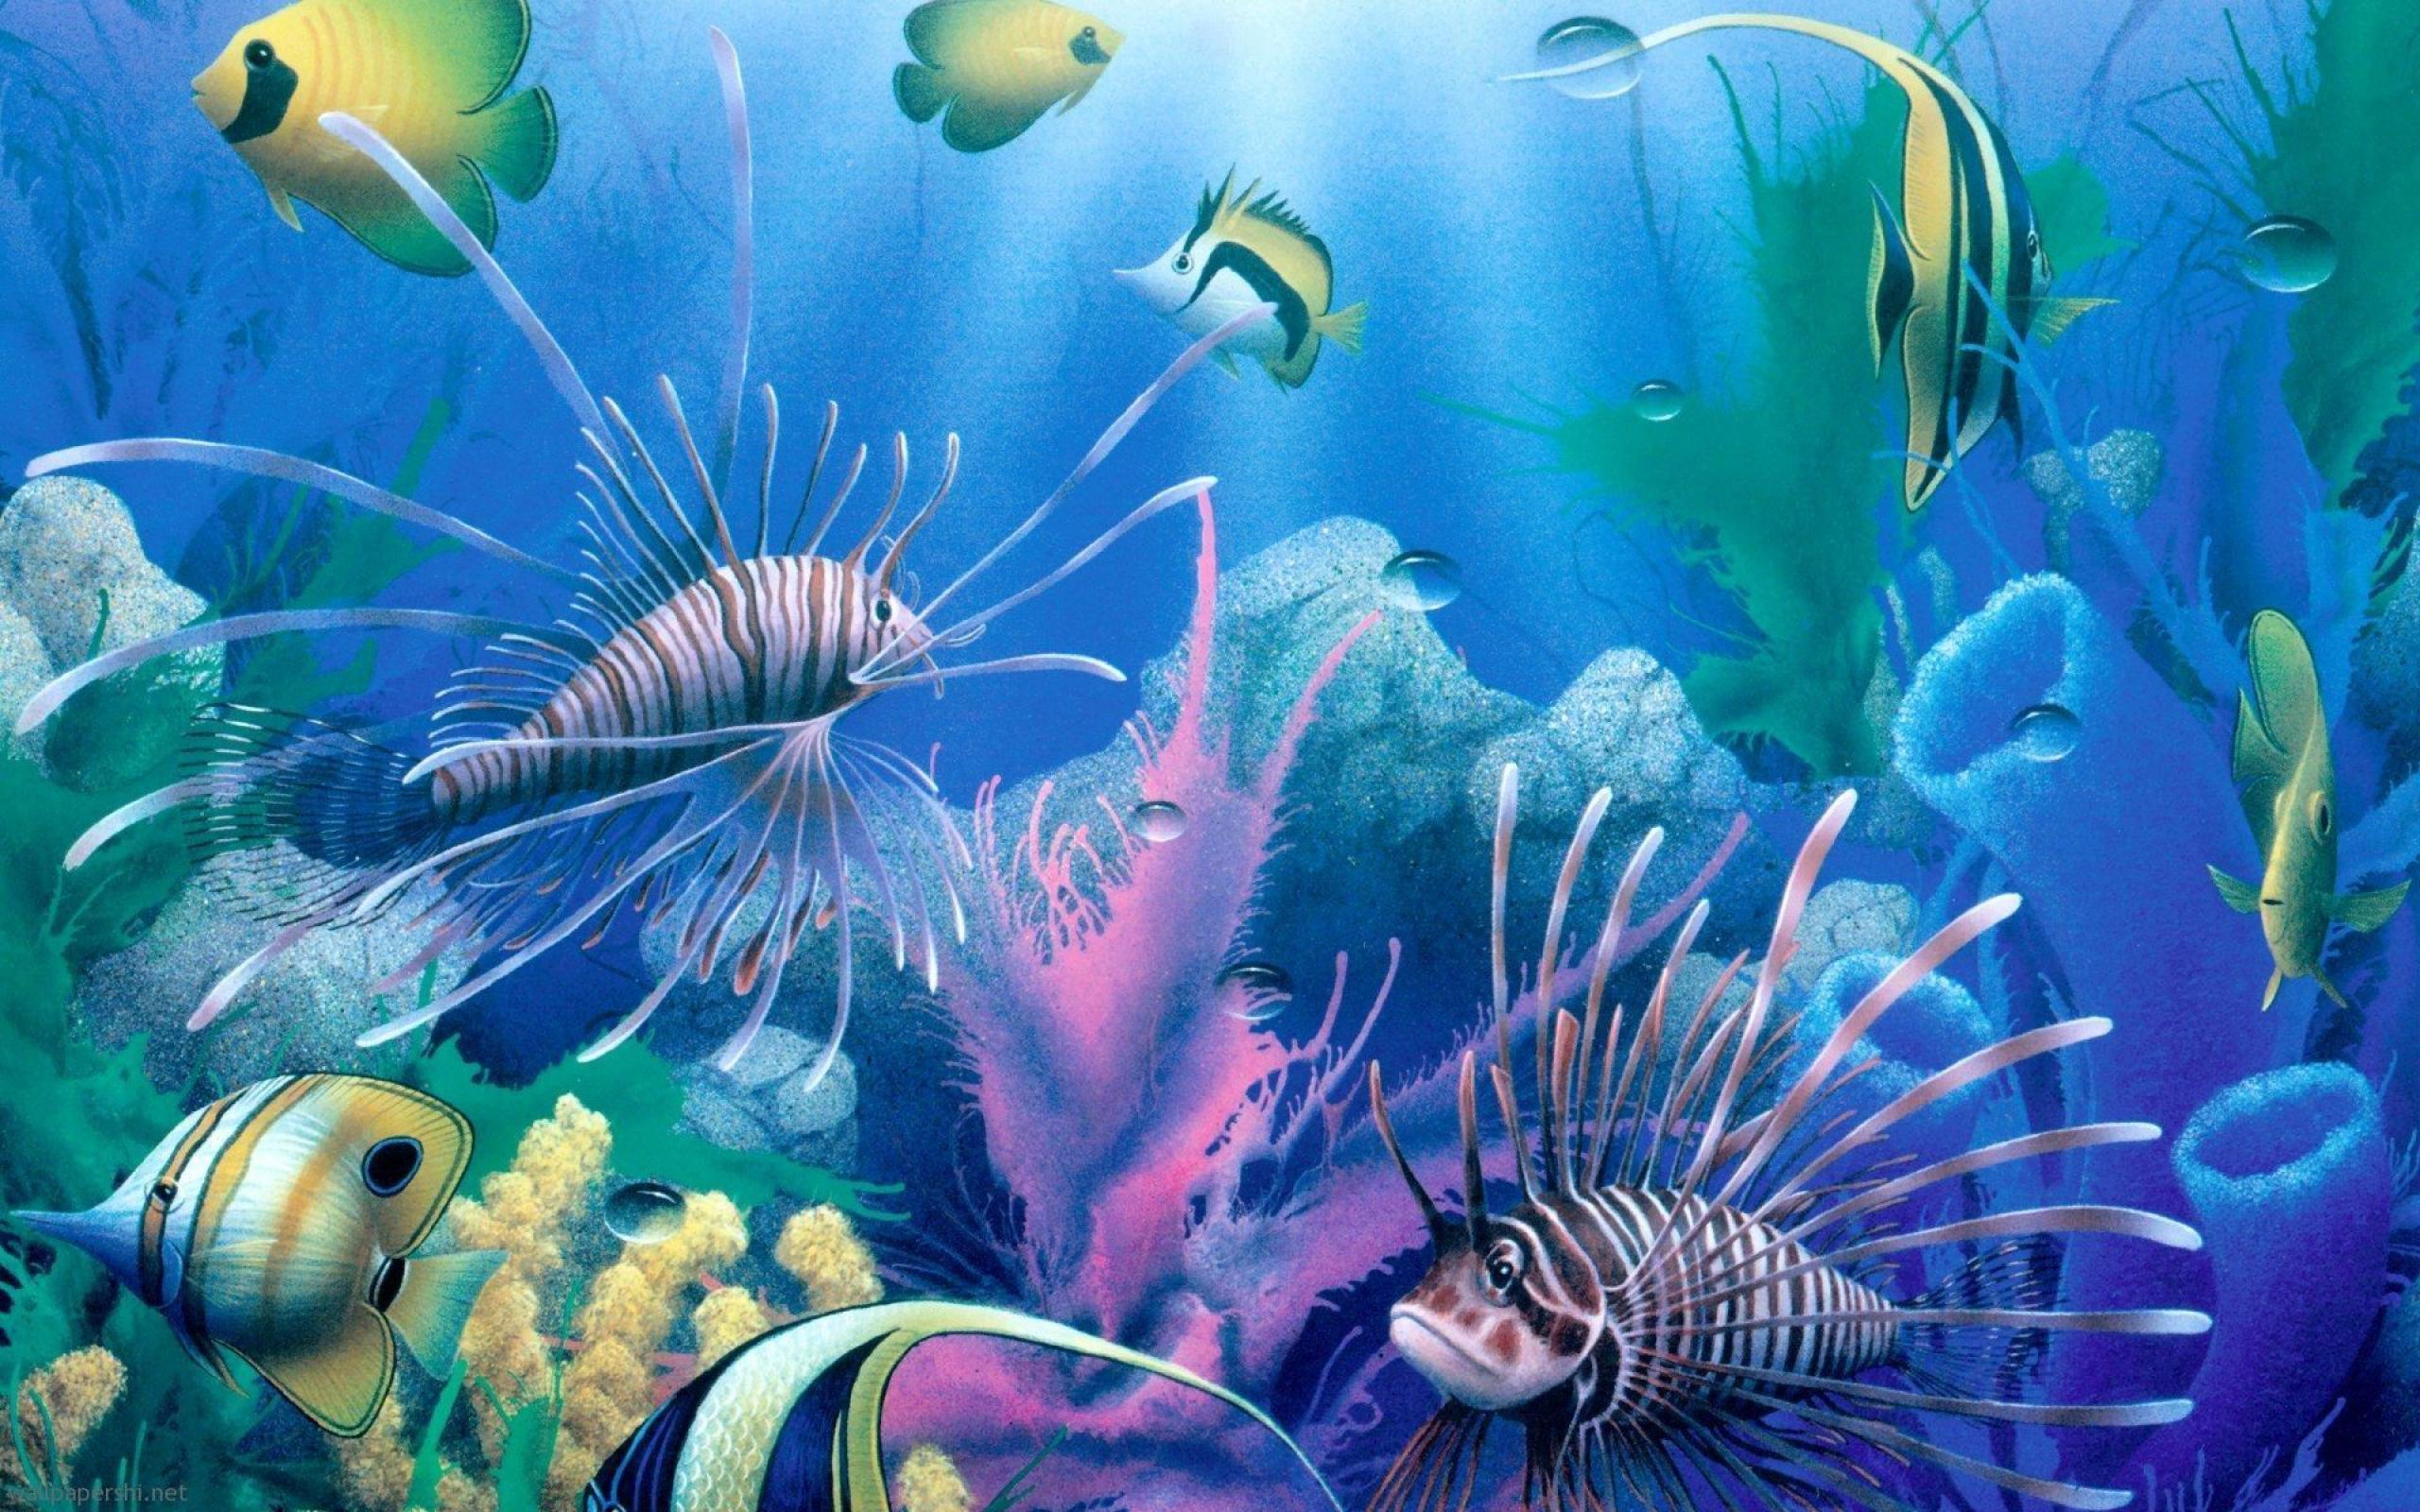 Deep Sea Wallpaper HD Freetopwallpapercom 2560x1600